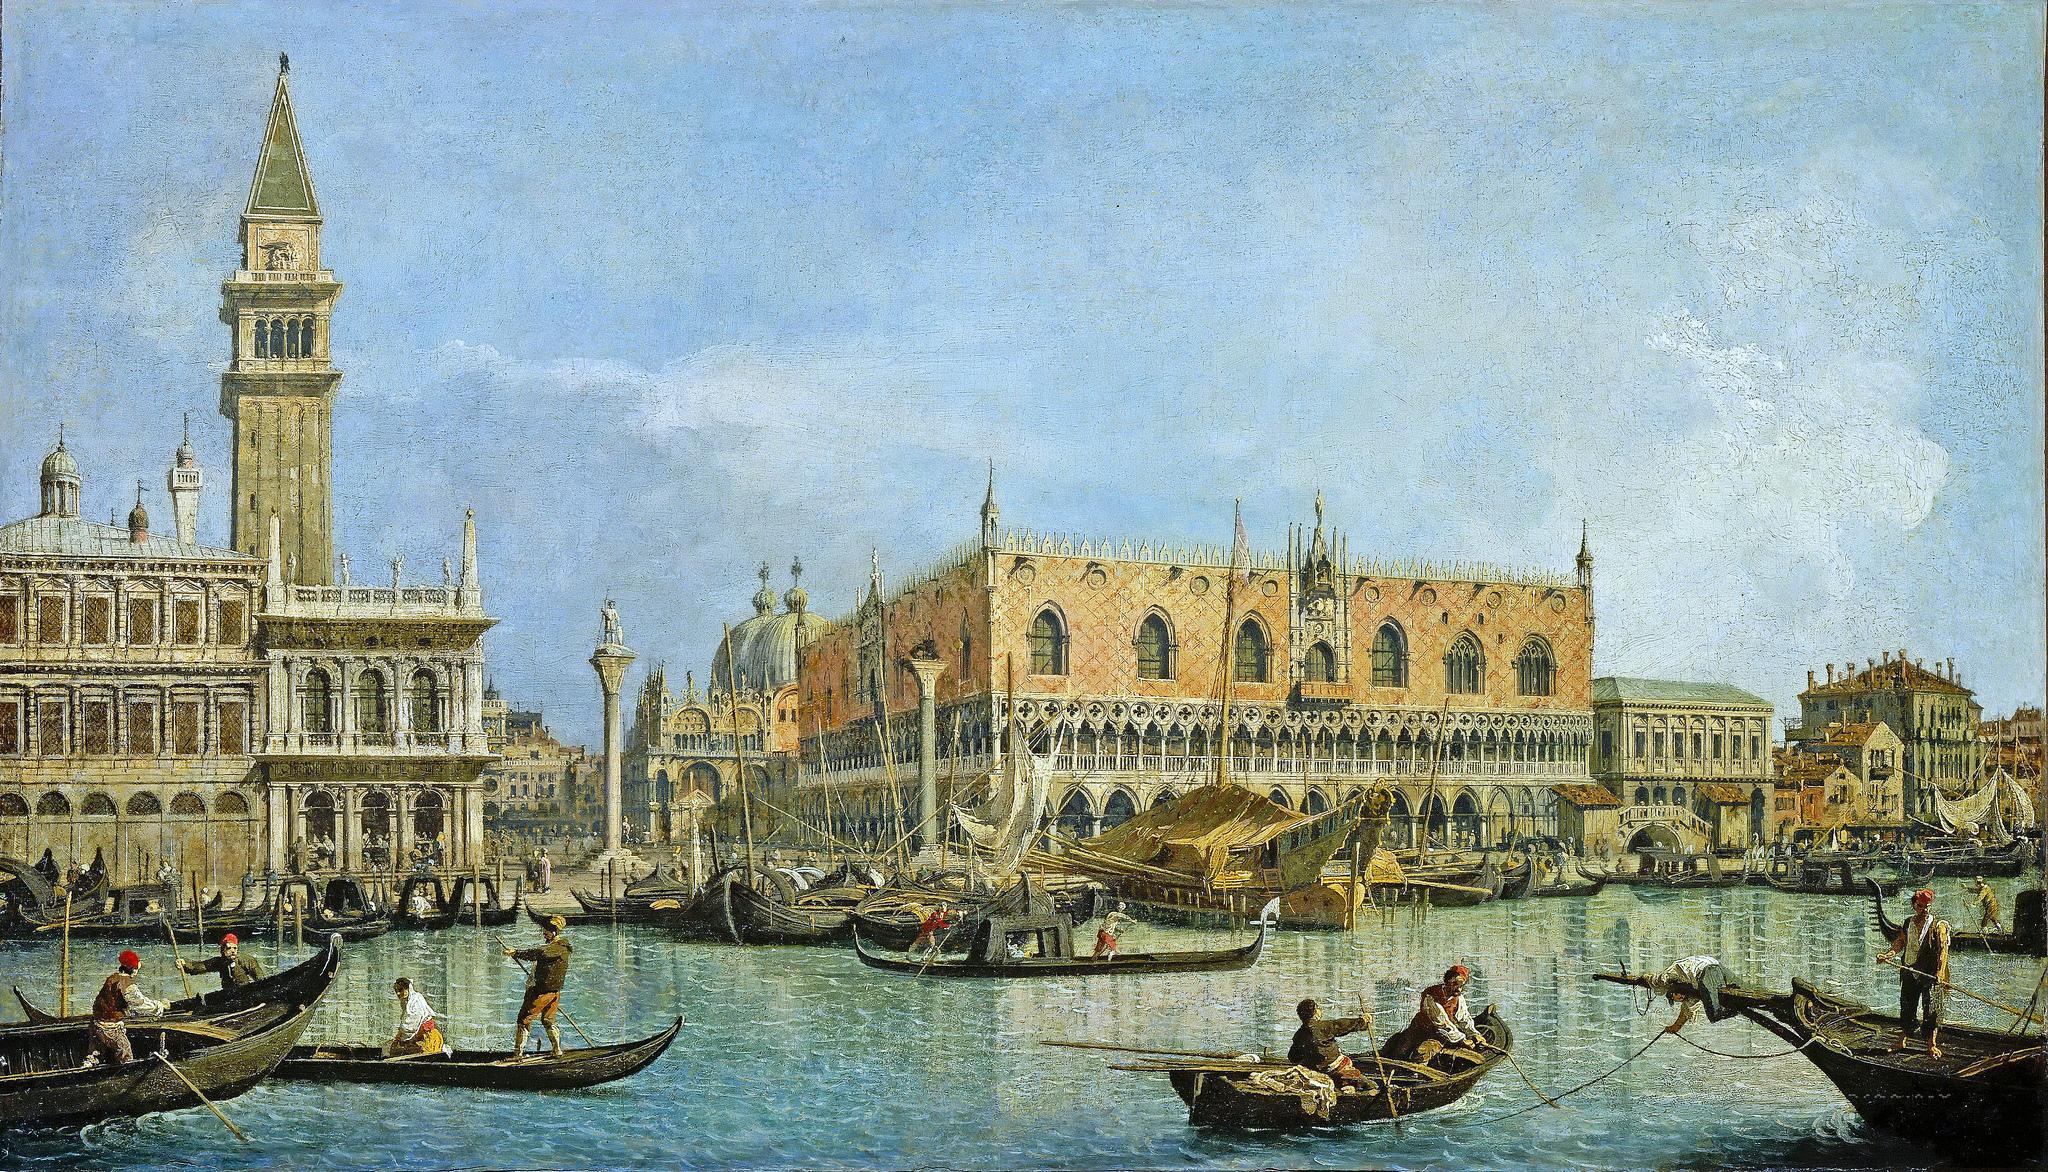 L'immagine rappresenta un dipinto diCanaletto, Venezia Palazzo Ducale, Mesée du Louvre Parigi